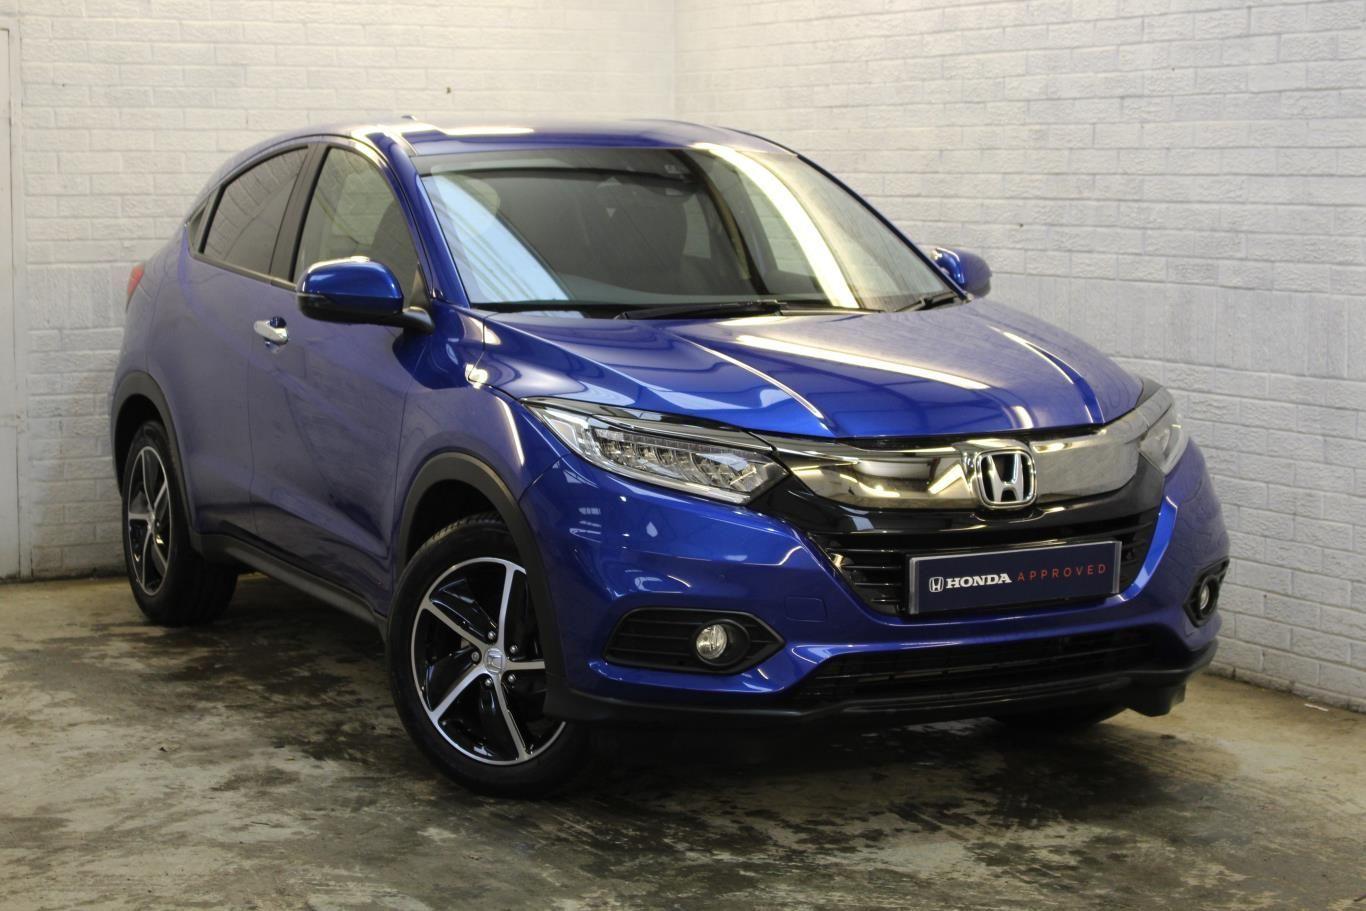 Honda HR-V 1.5 i-VTEC SE